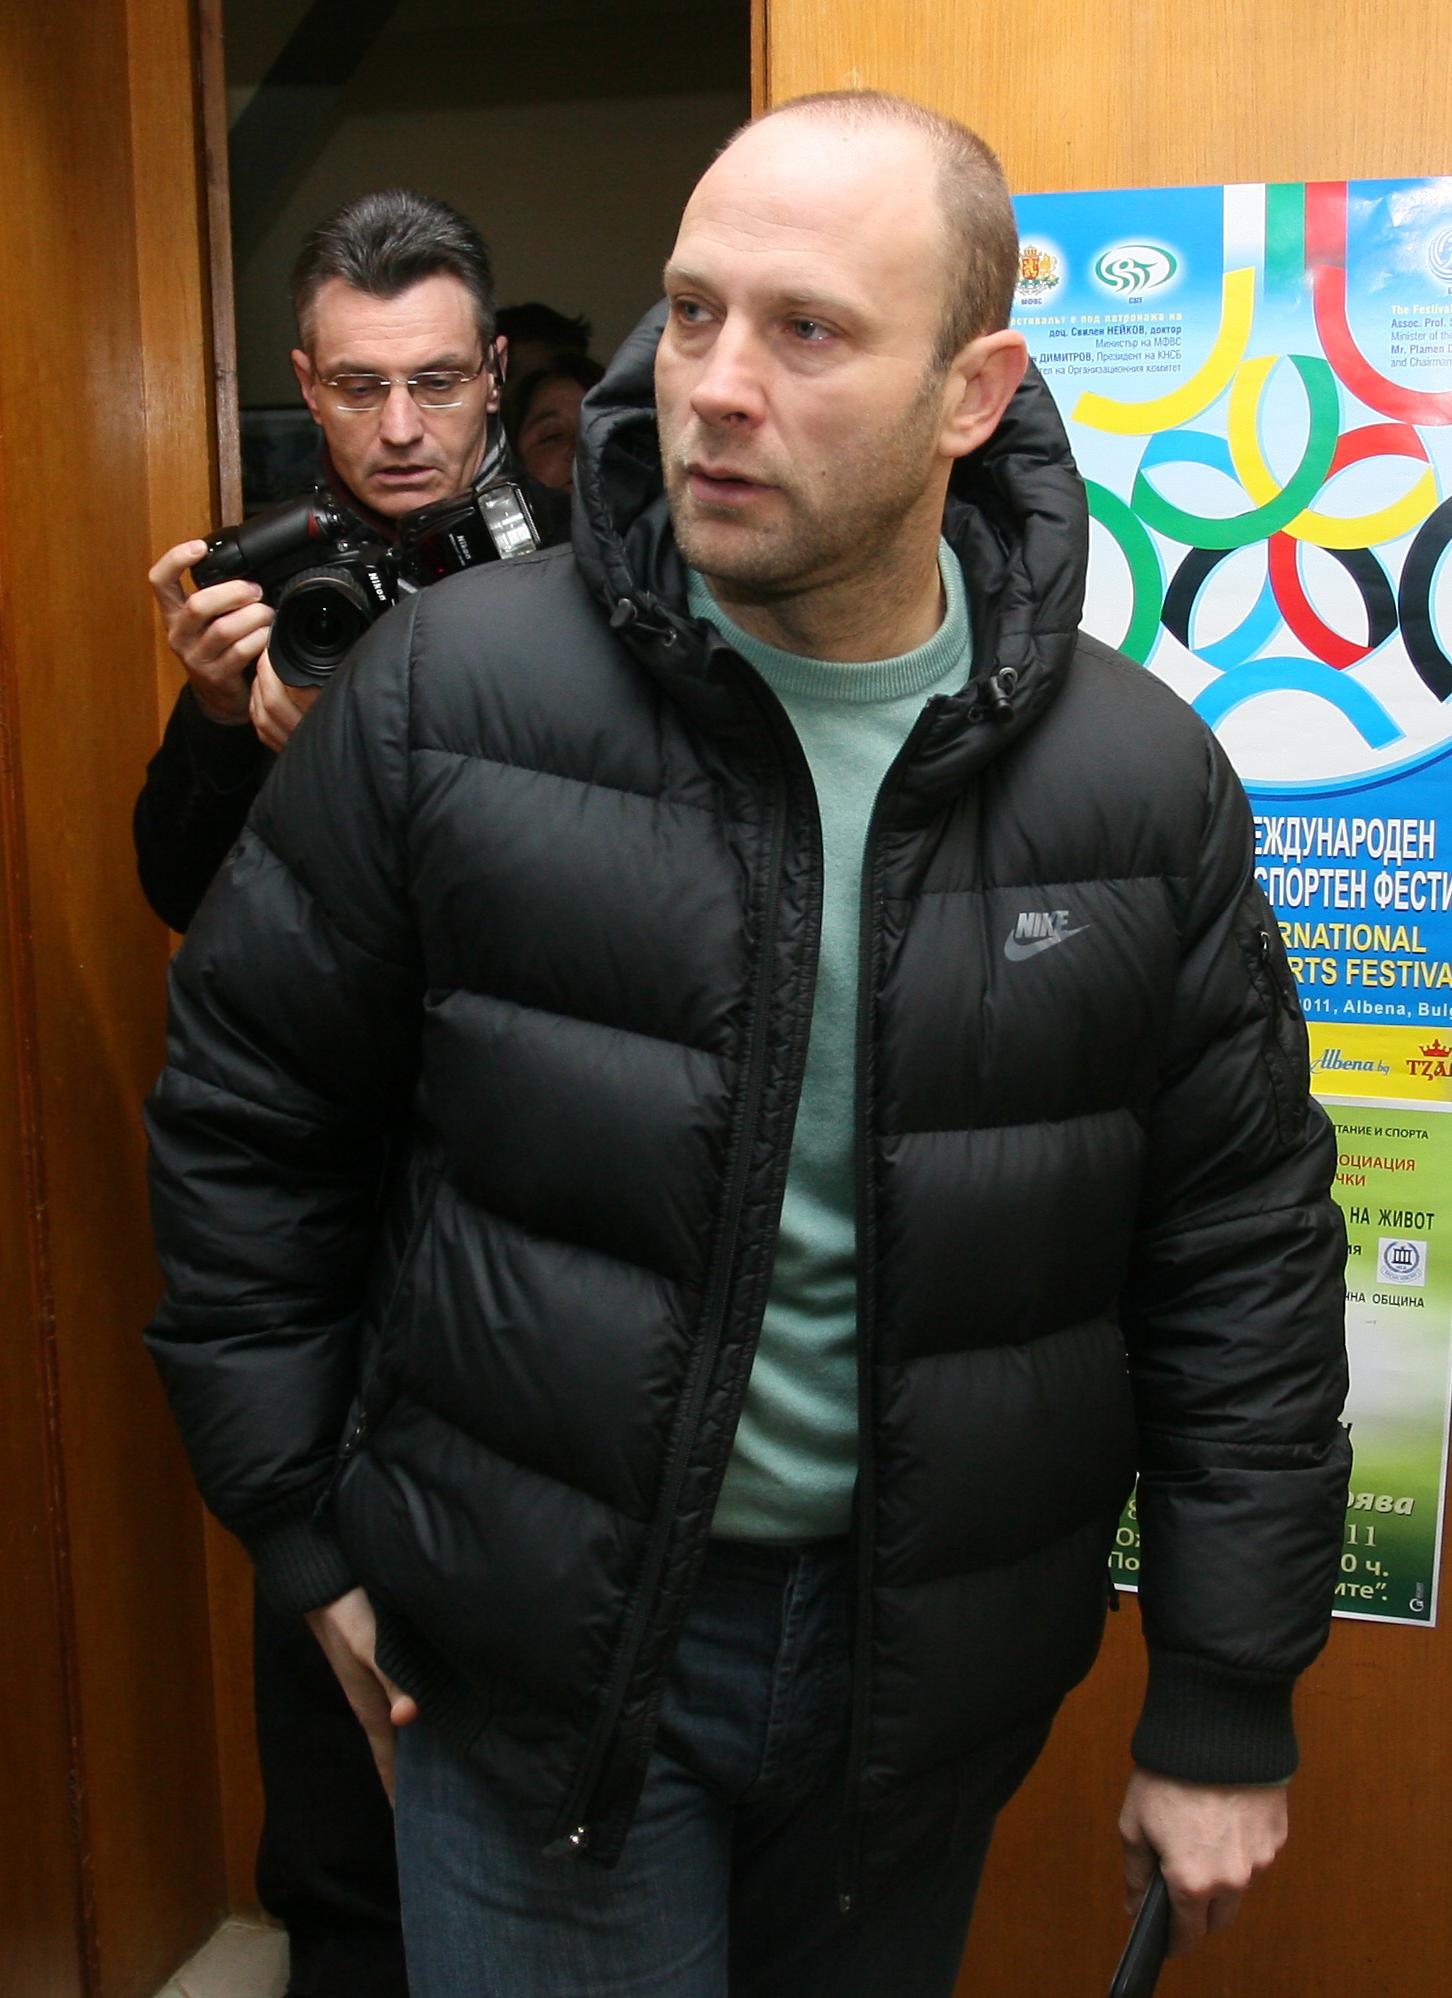 Тити Папазов преди финала: По-хладнокръвният ще победи